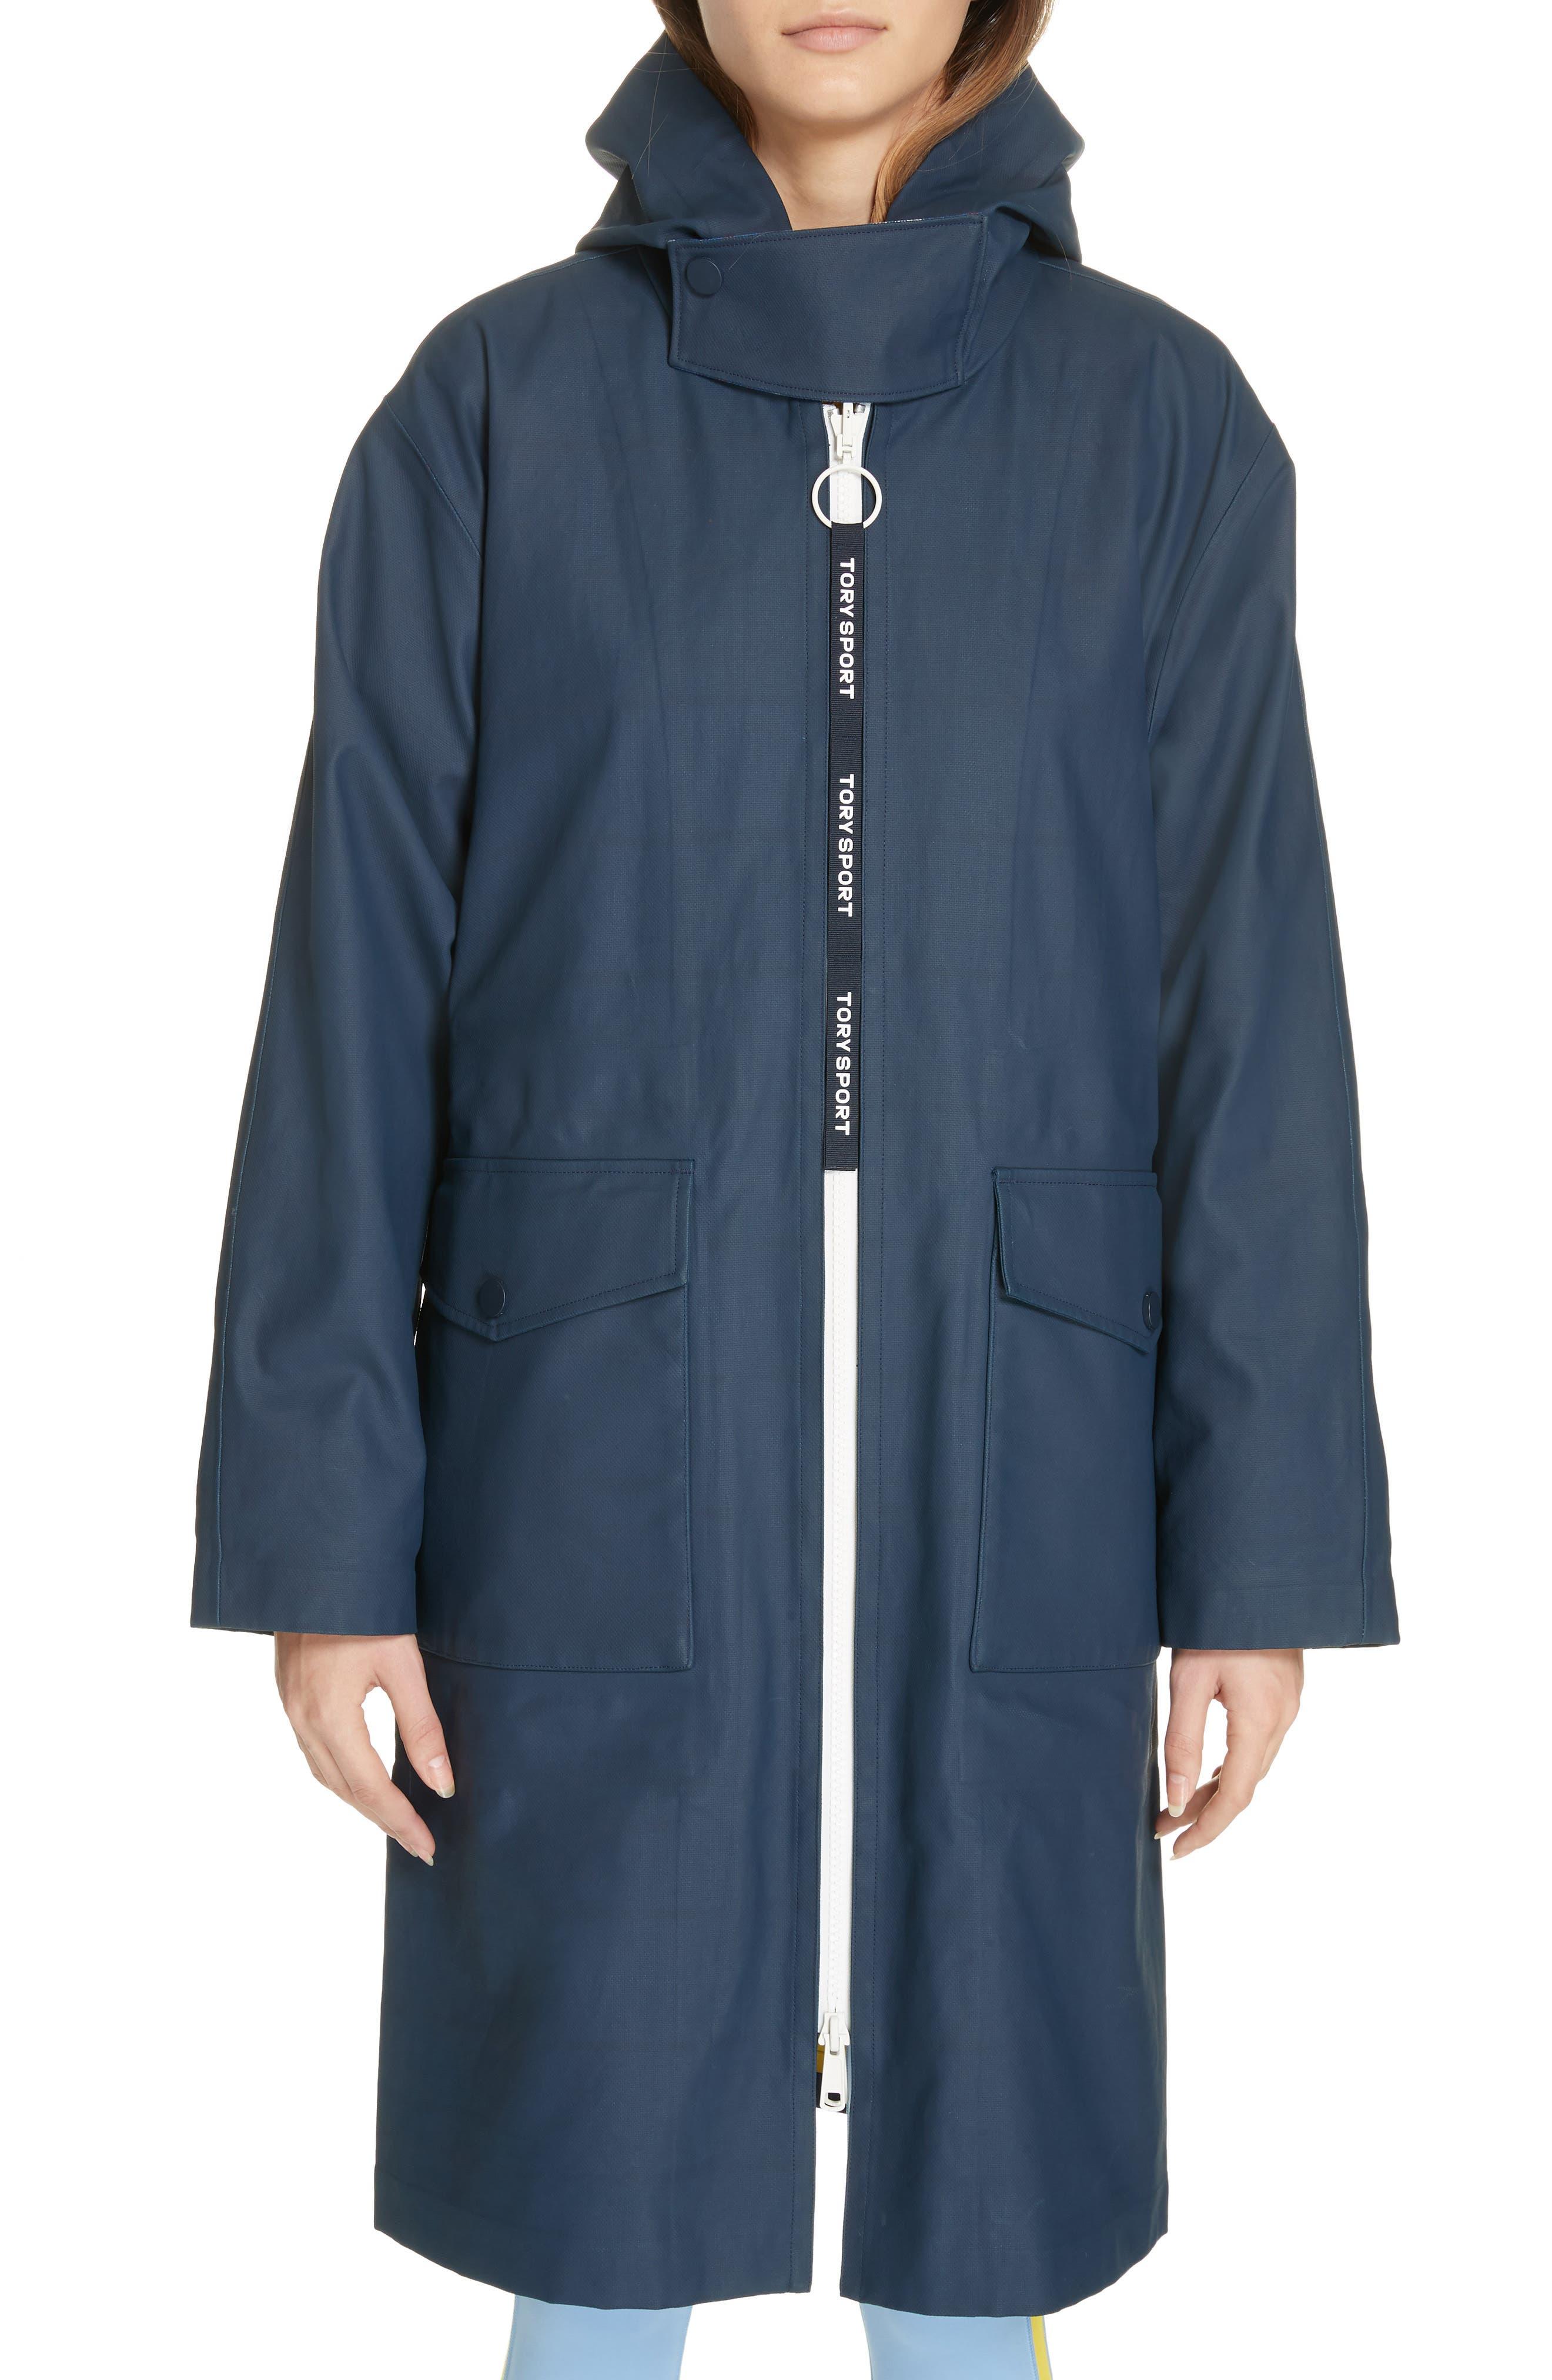 TORY SPORT, Reversible Coated Canvas Rain Coat, Alternate thumbnail 2, color, TANDEM PLAID LARGE SURF BLUE